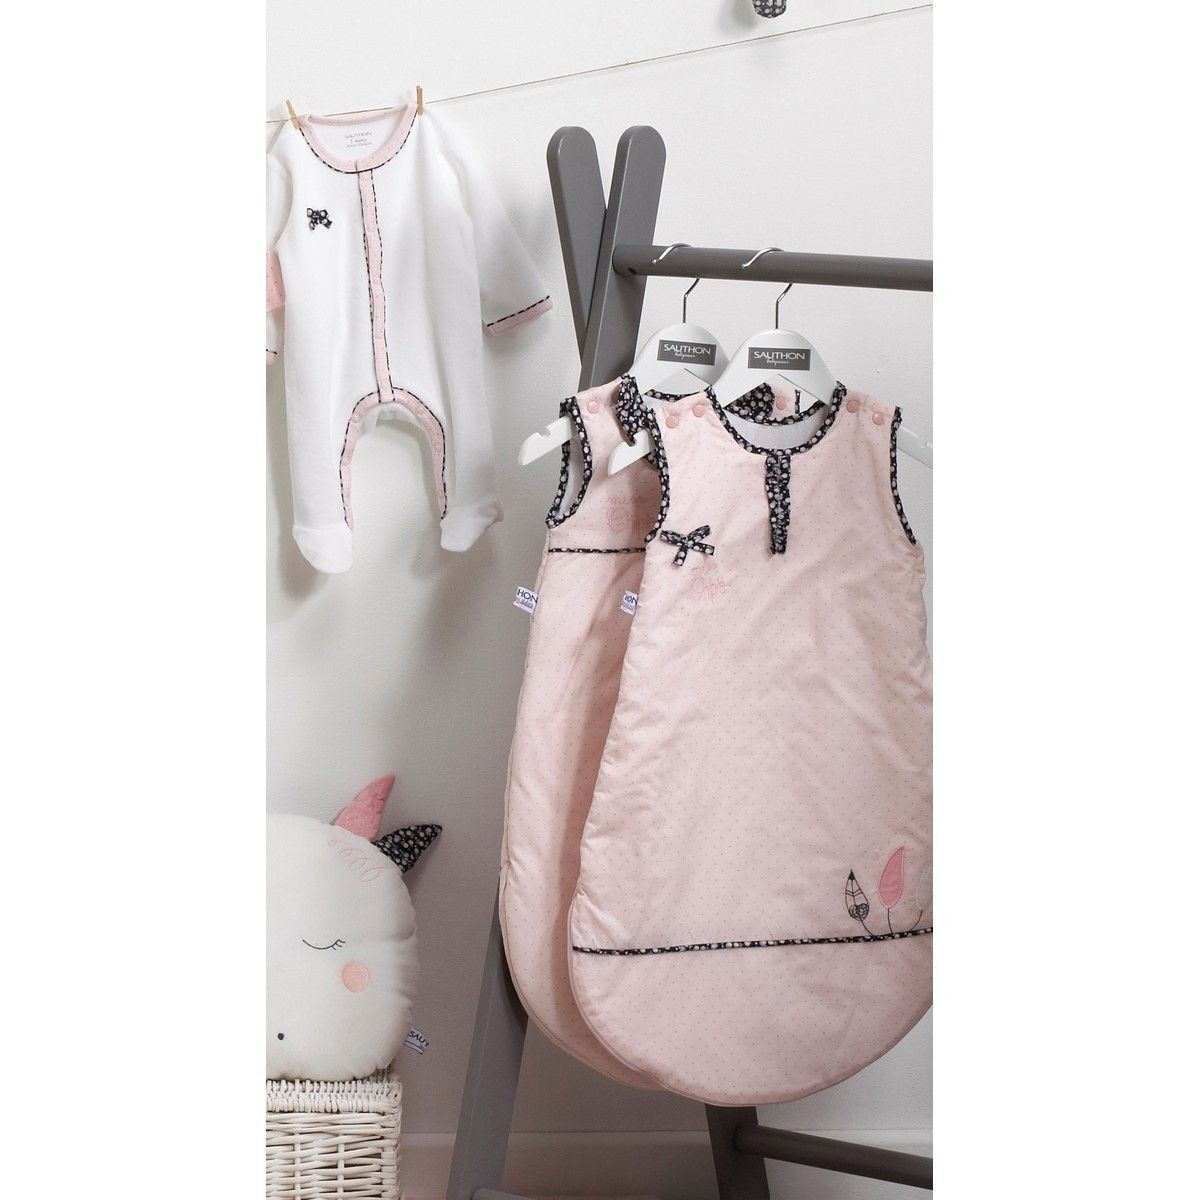 729b15b205315 Quel pyjama d été adopter pour mon bébé